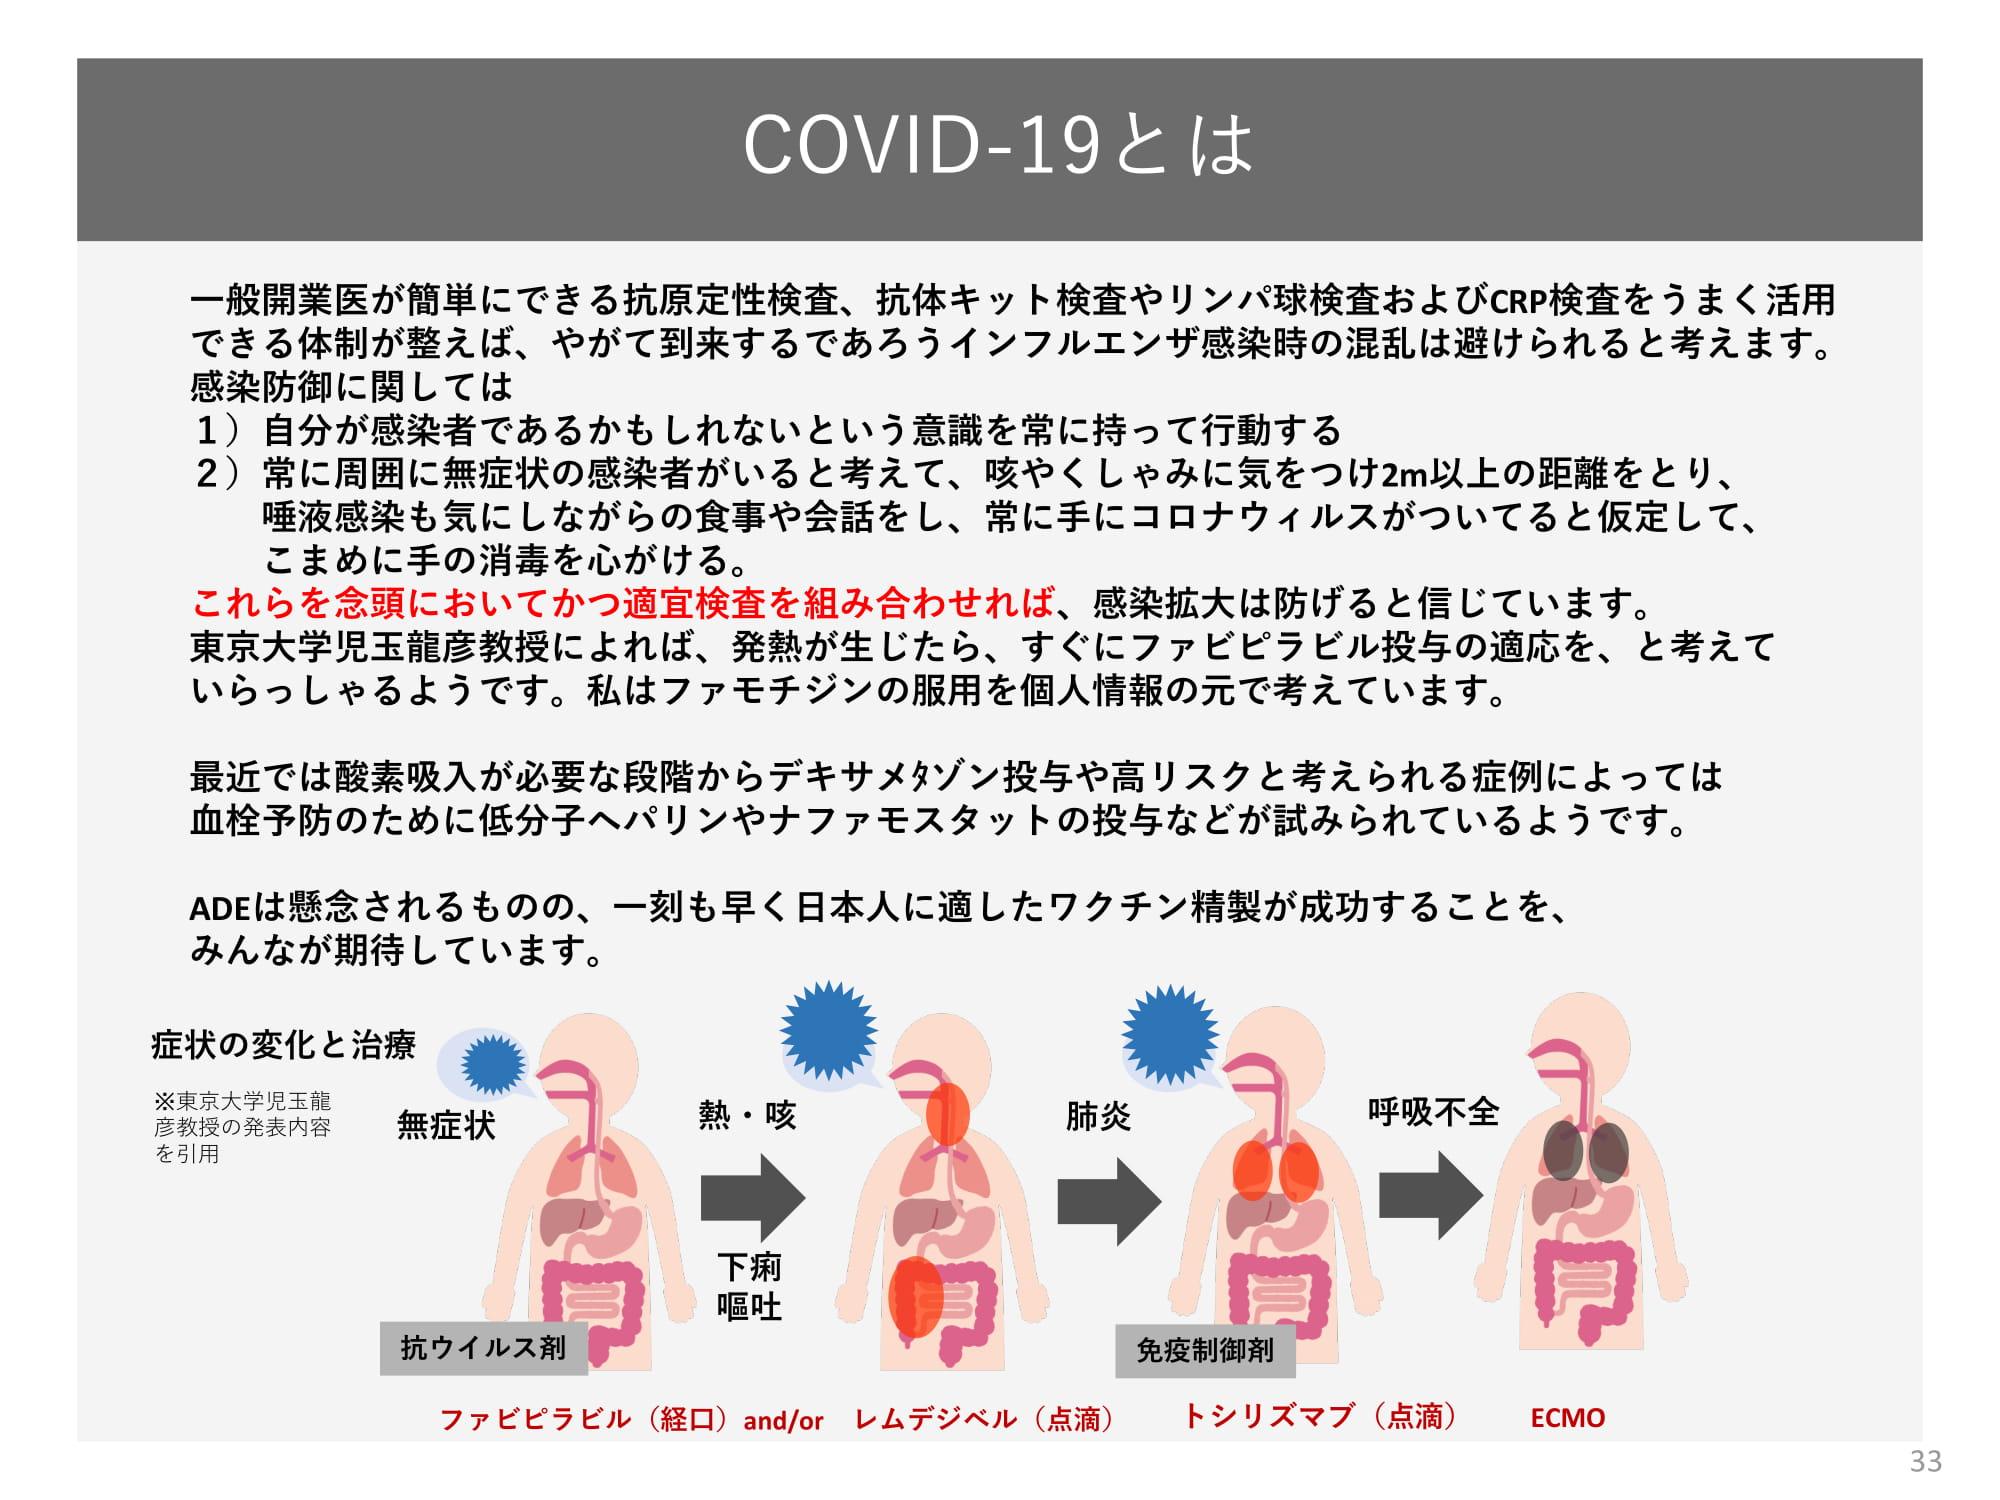 COVID-19_20200904-33.jpg